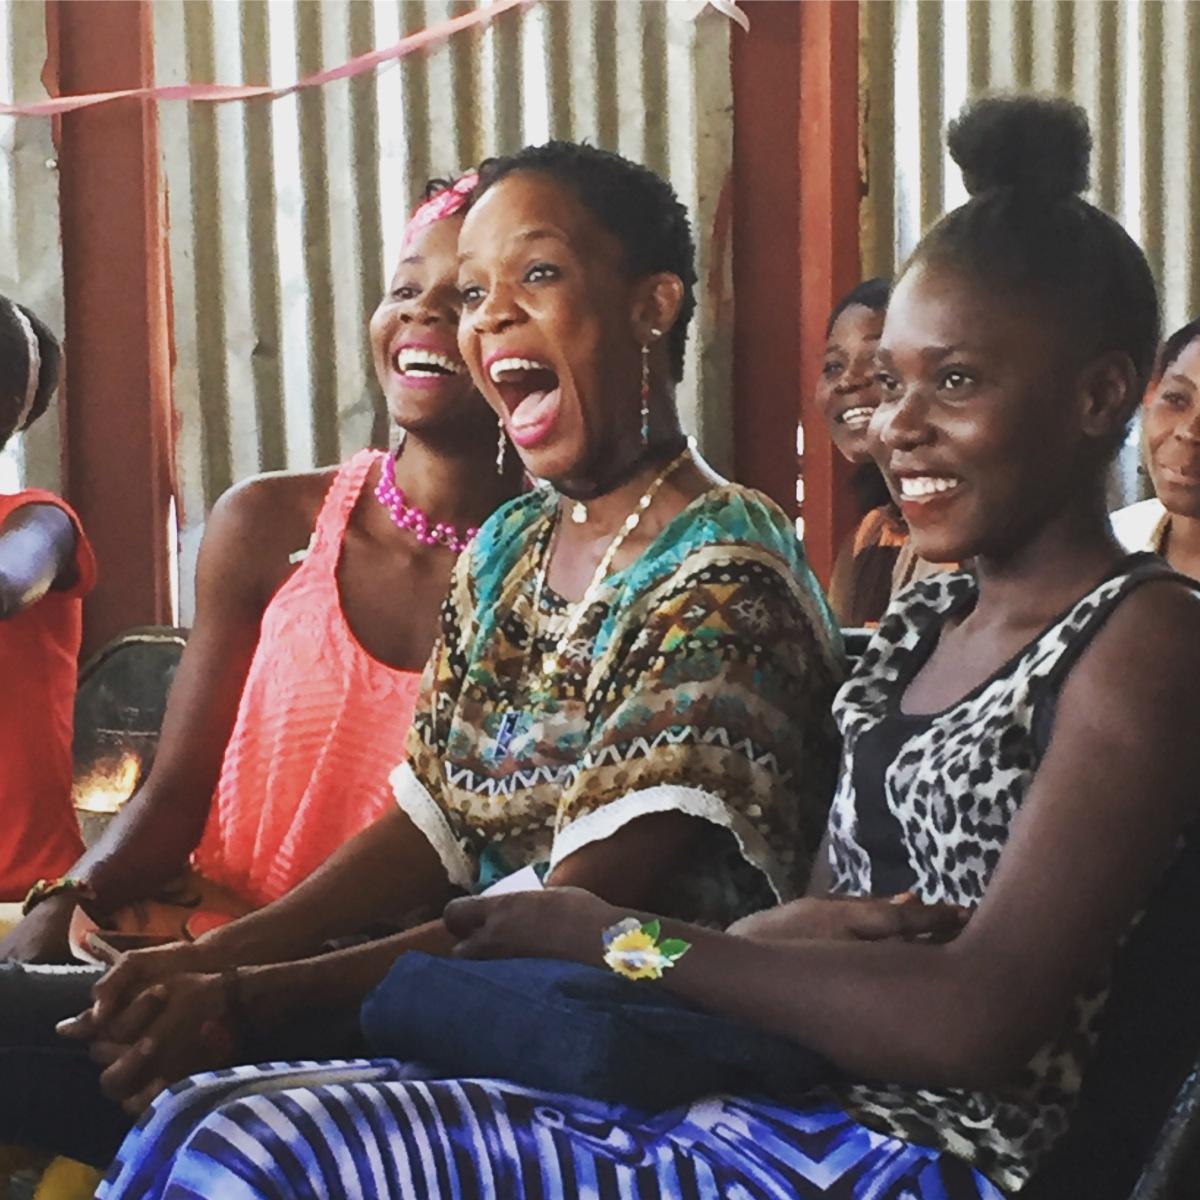 A Glimpse of Young LifeHaiti